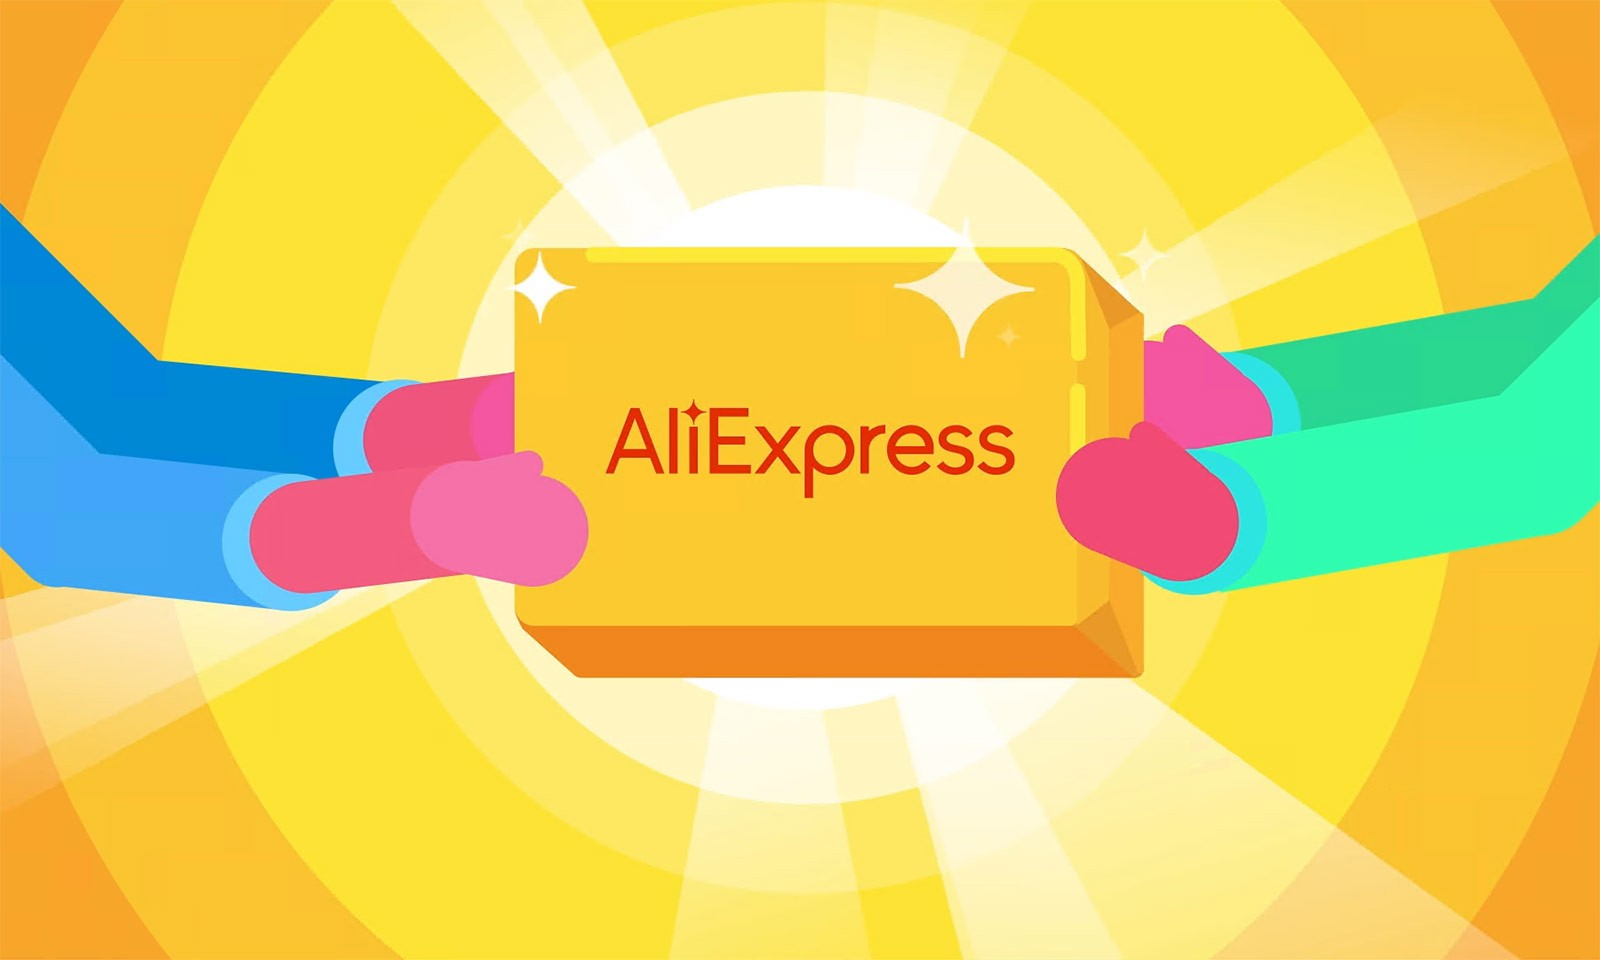 Colete de la AliExpress